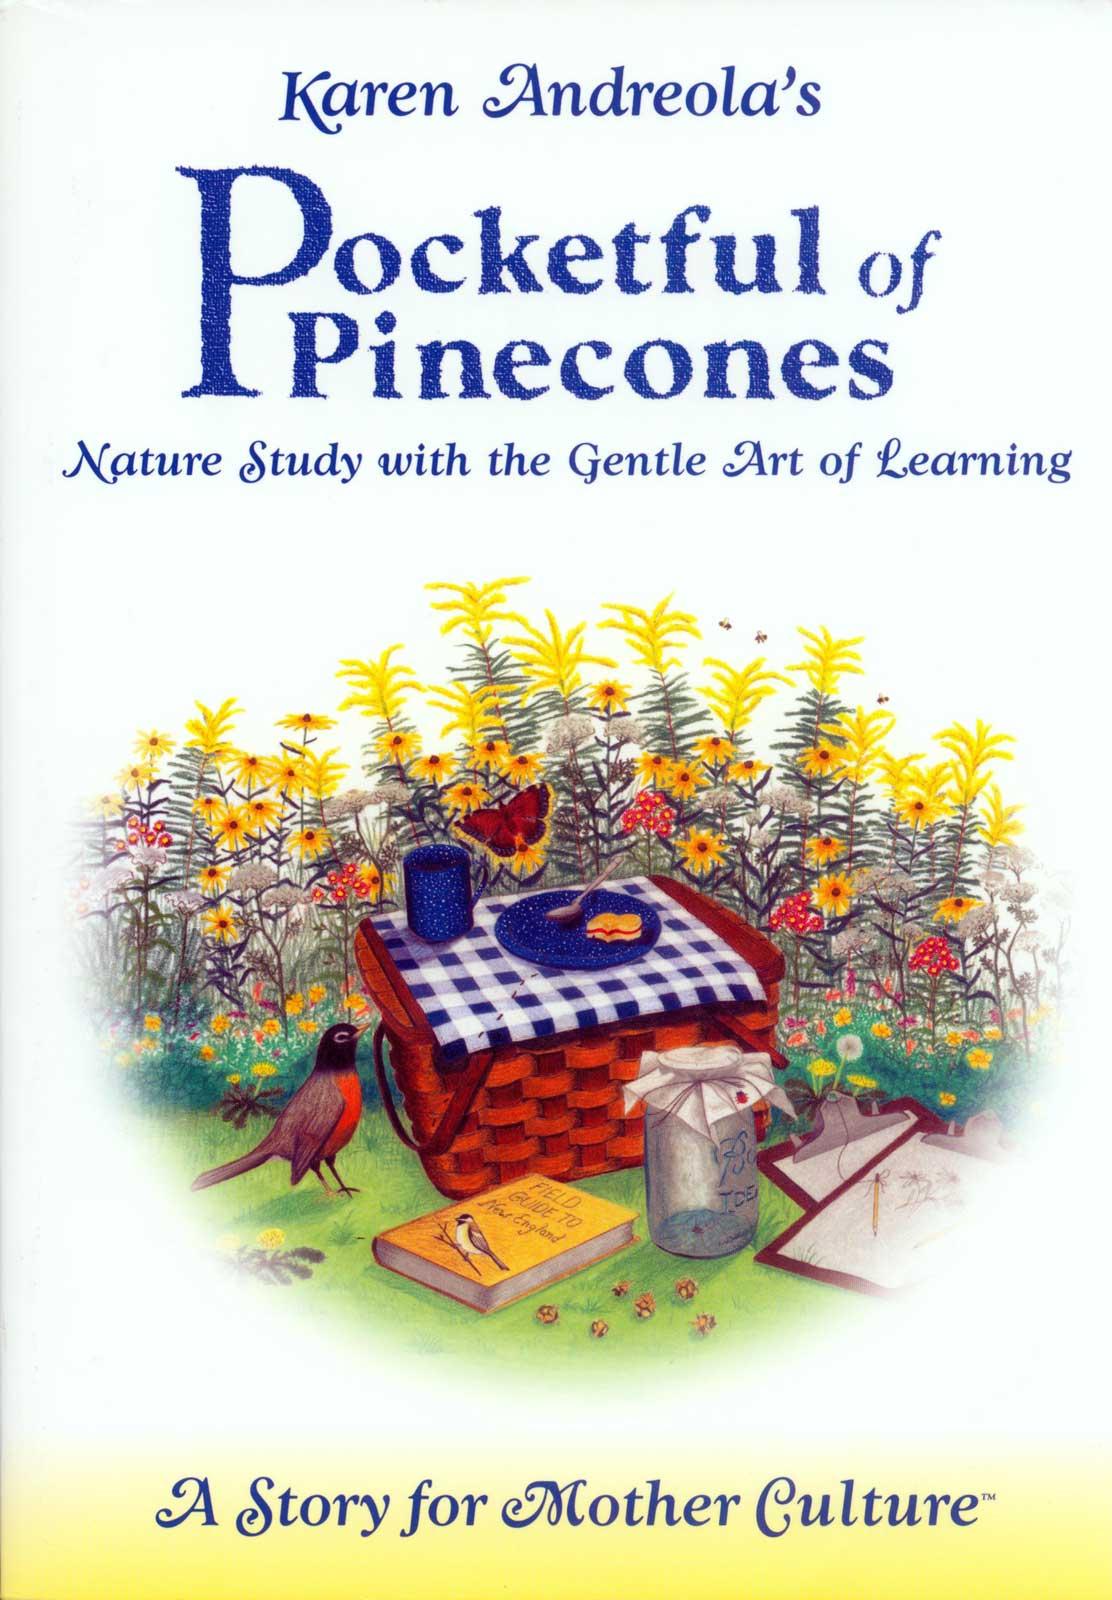 Pocketful of Pinecones